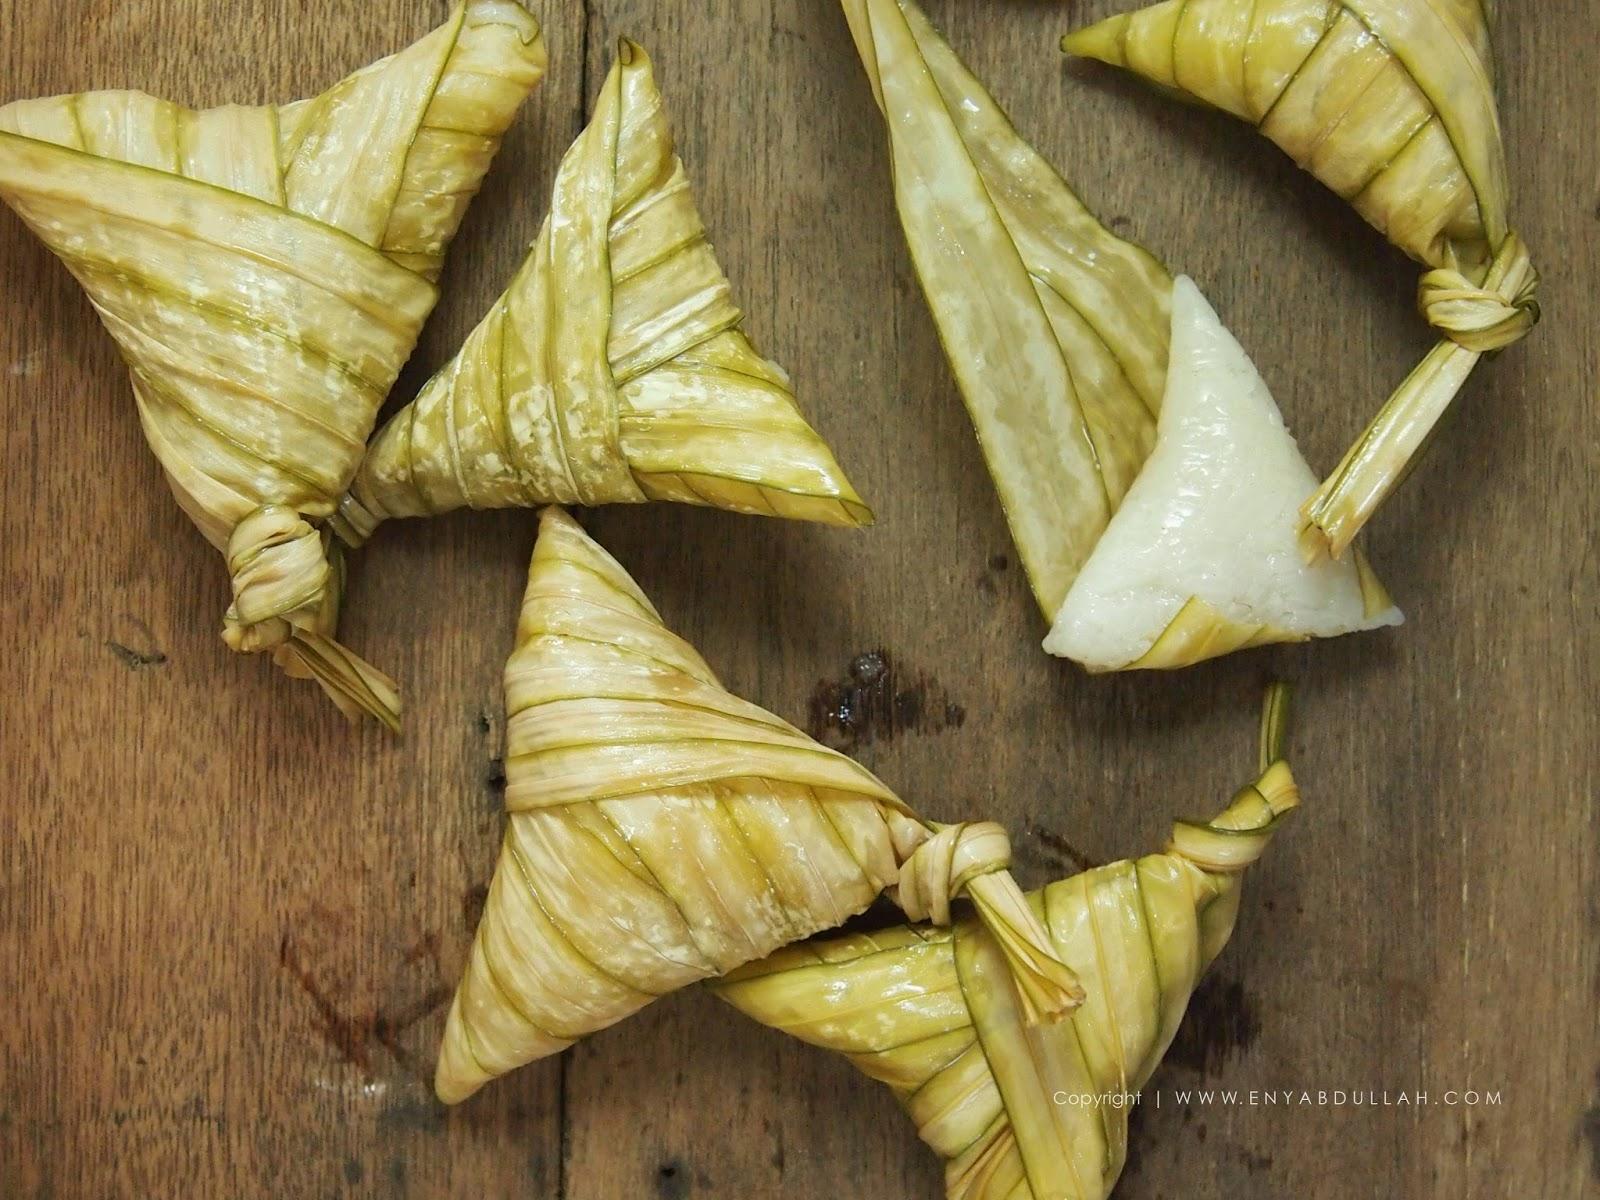 We're team ketupat palas all the way!